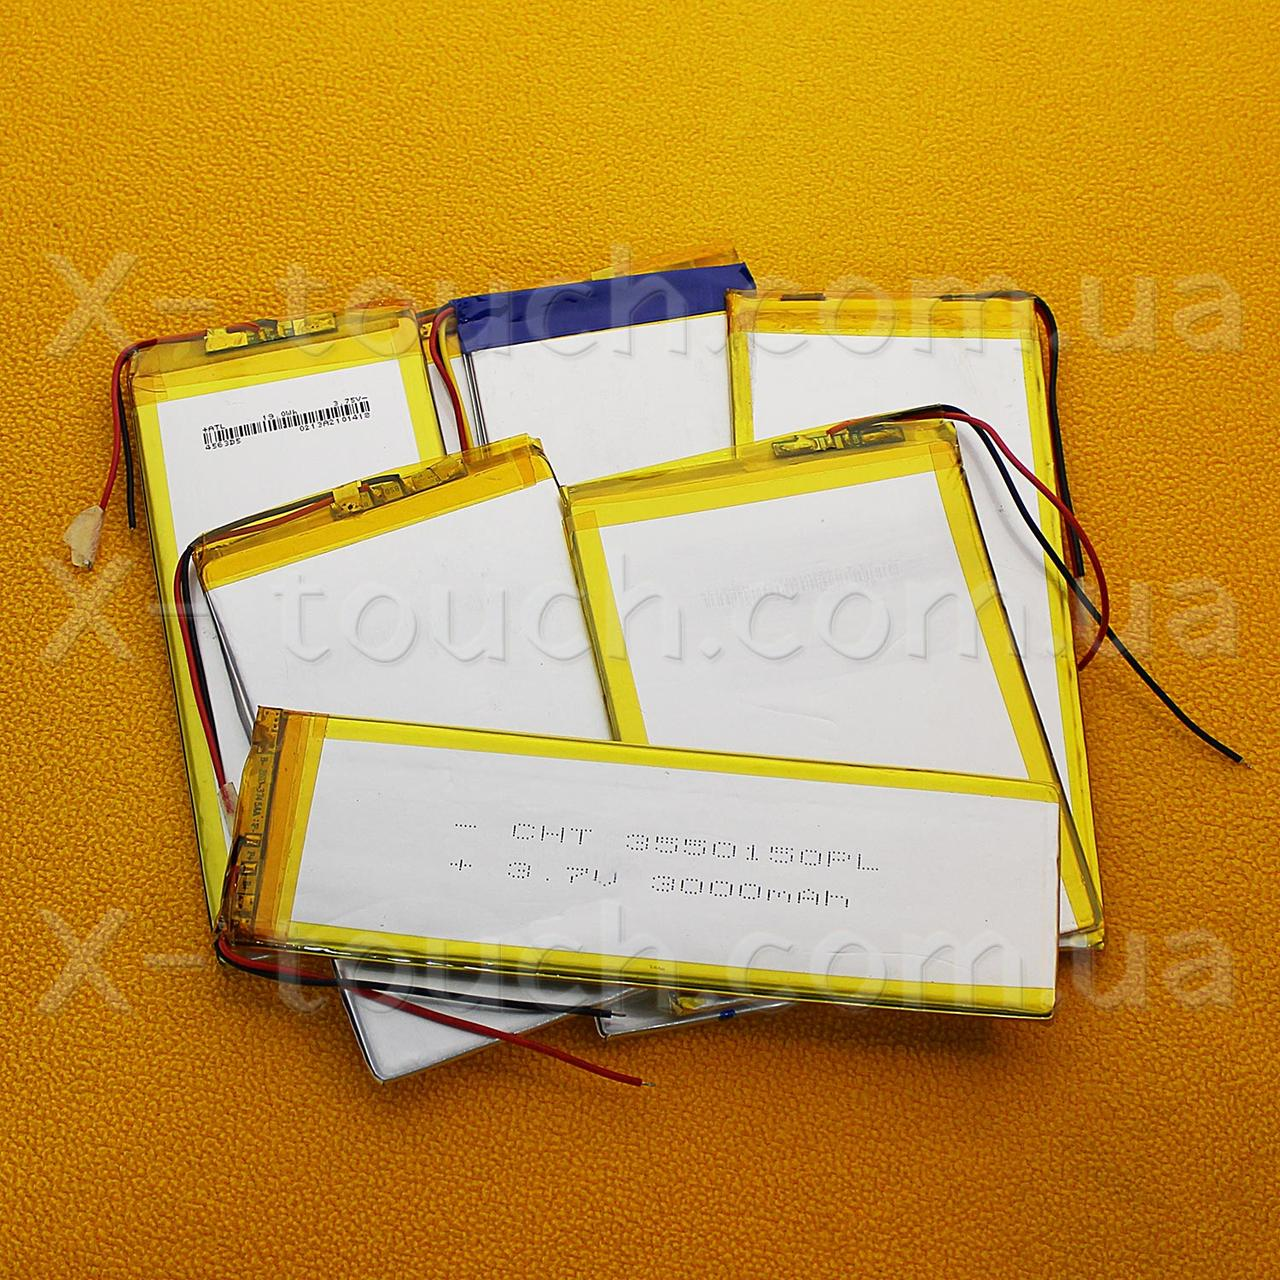 Аккумулятор, батарея для планшета Impression ImPAD 3113, 3,7V, 5000mAh